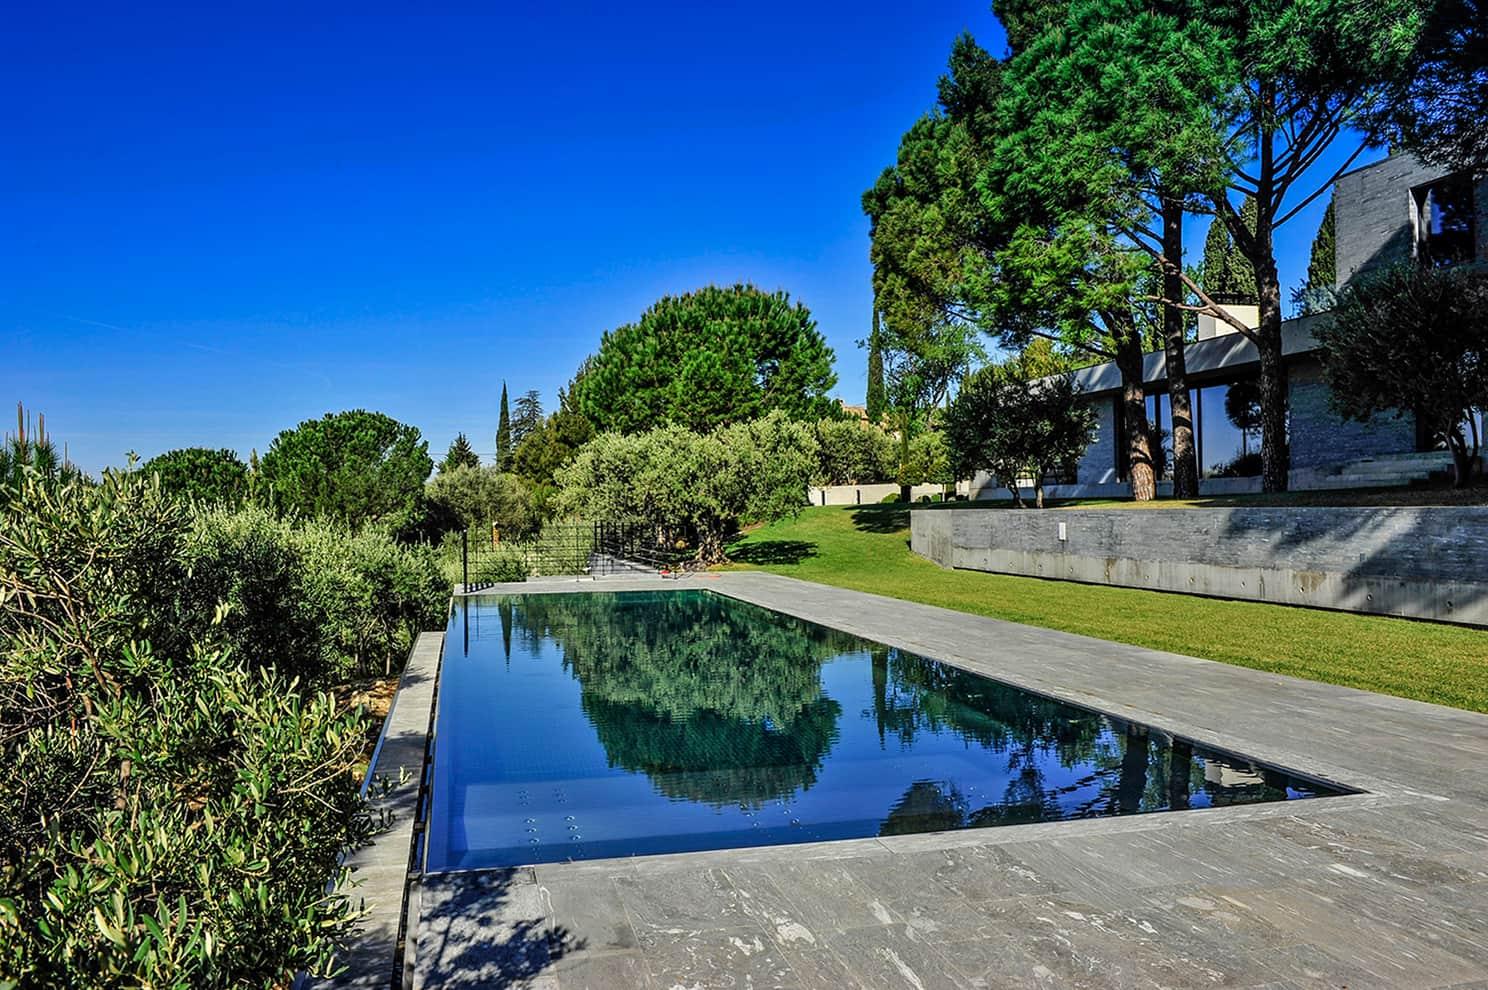 profondeur ideale piscine trendy piscine de louvres with profondeur ideale piscine cool quel. Black Bedroom Furniture Sets. Home Design Ideas